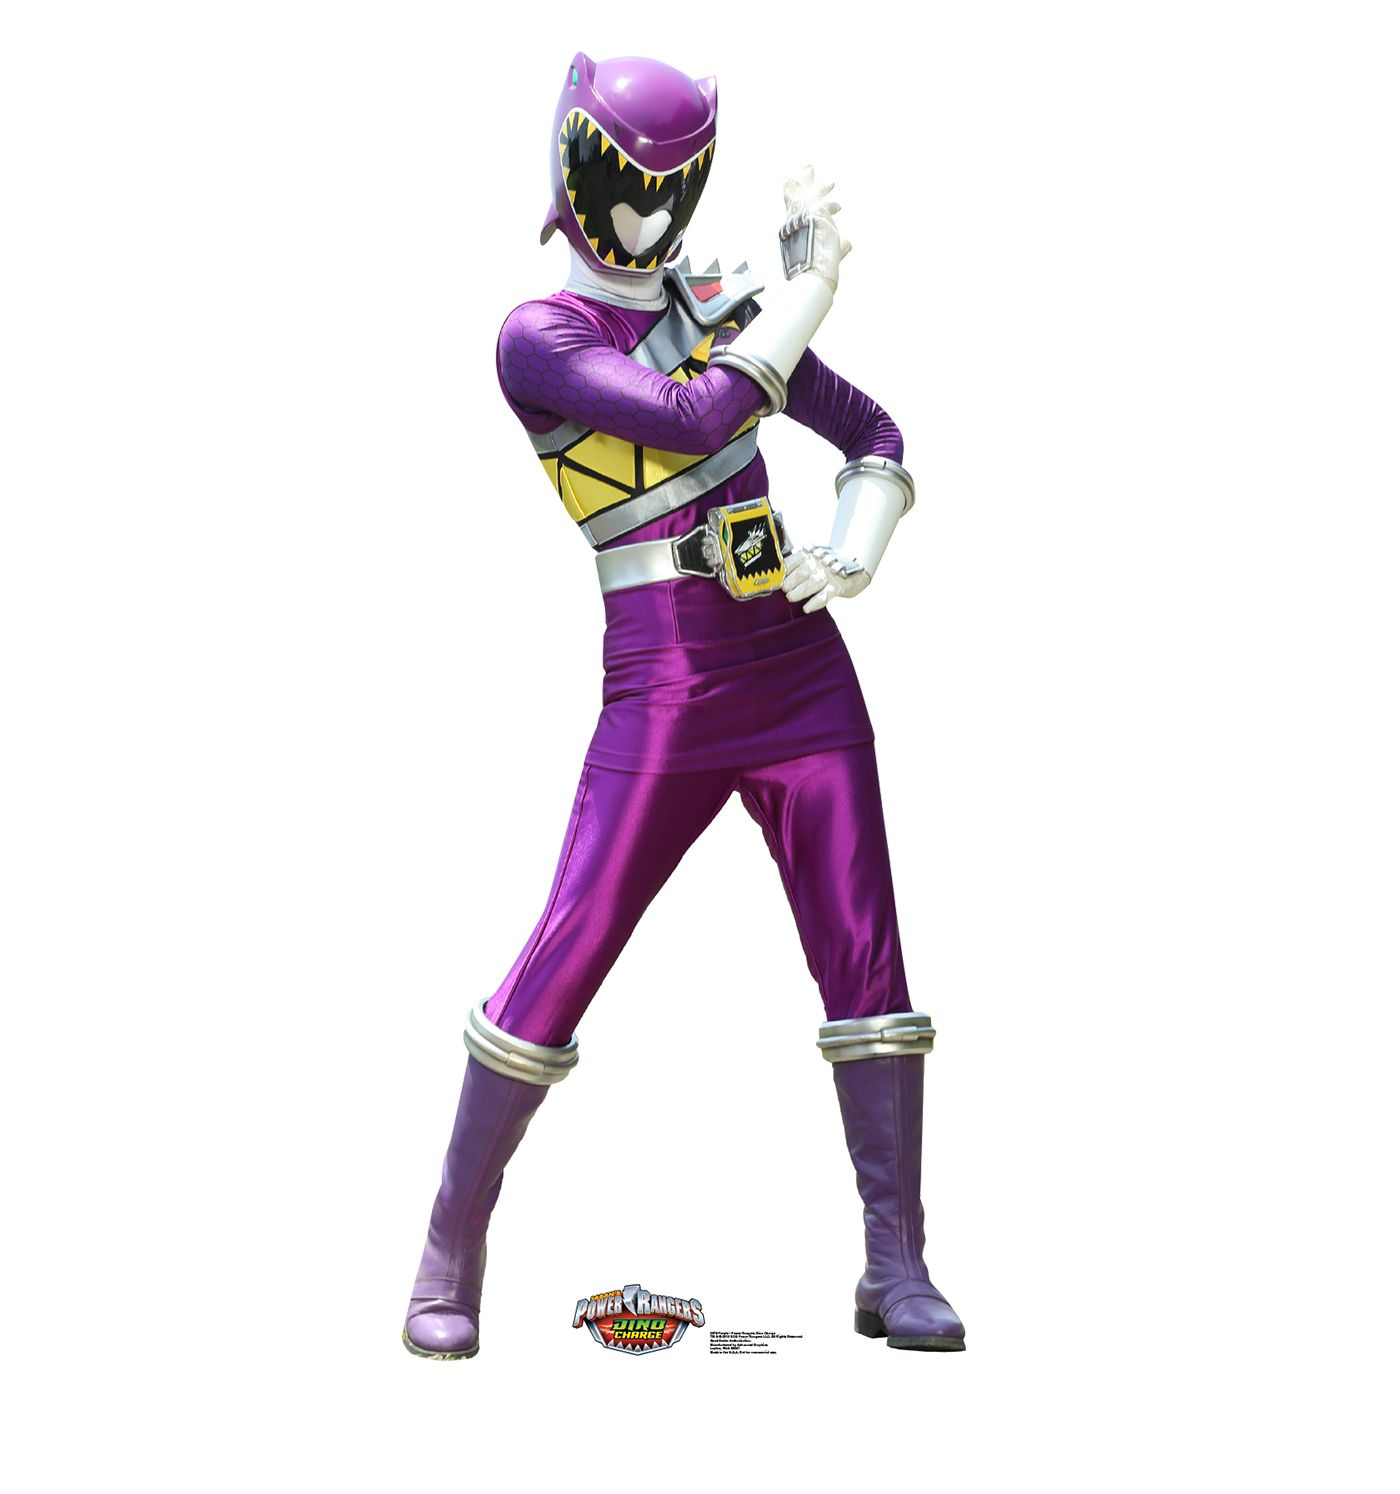 Purple Ranger Dinocharge Powerrrangers Power Rangers Dino Charge Power Rangers Dino Power Rangers